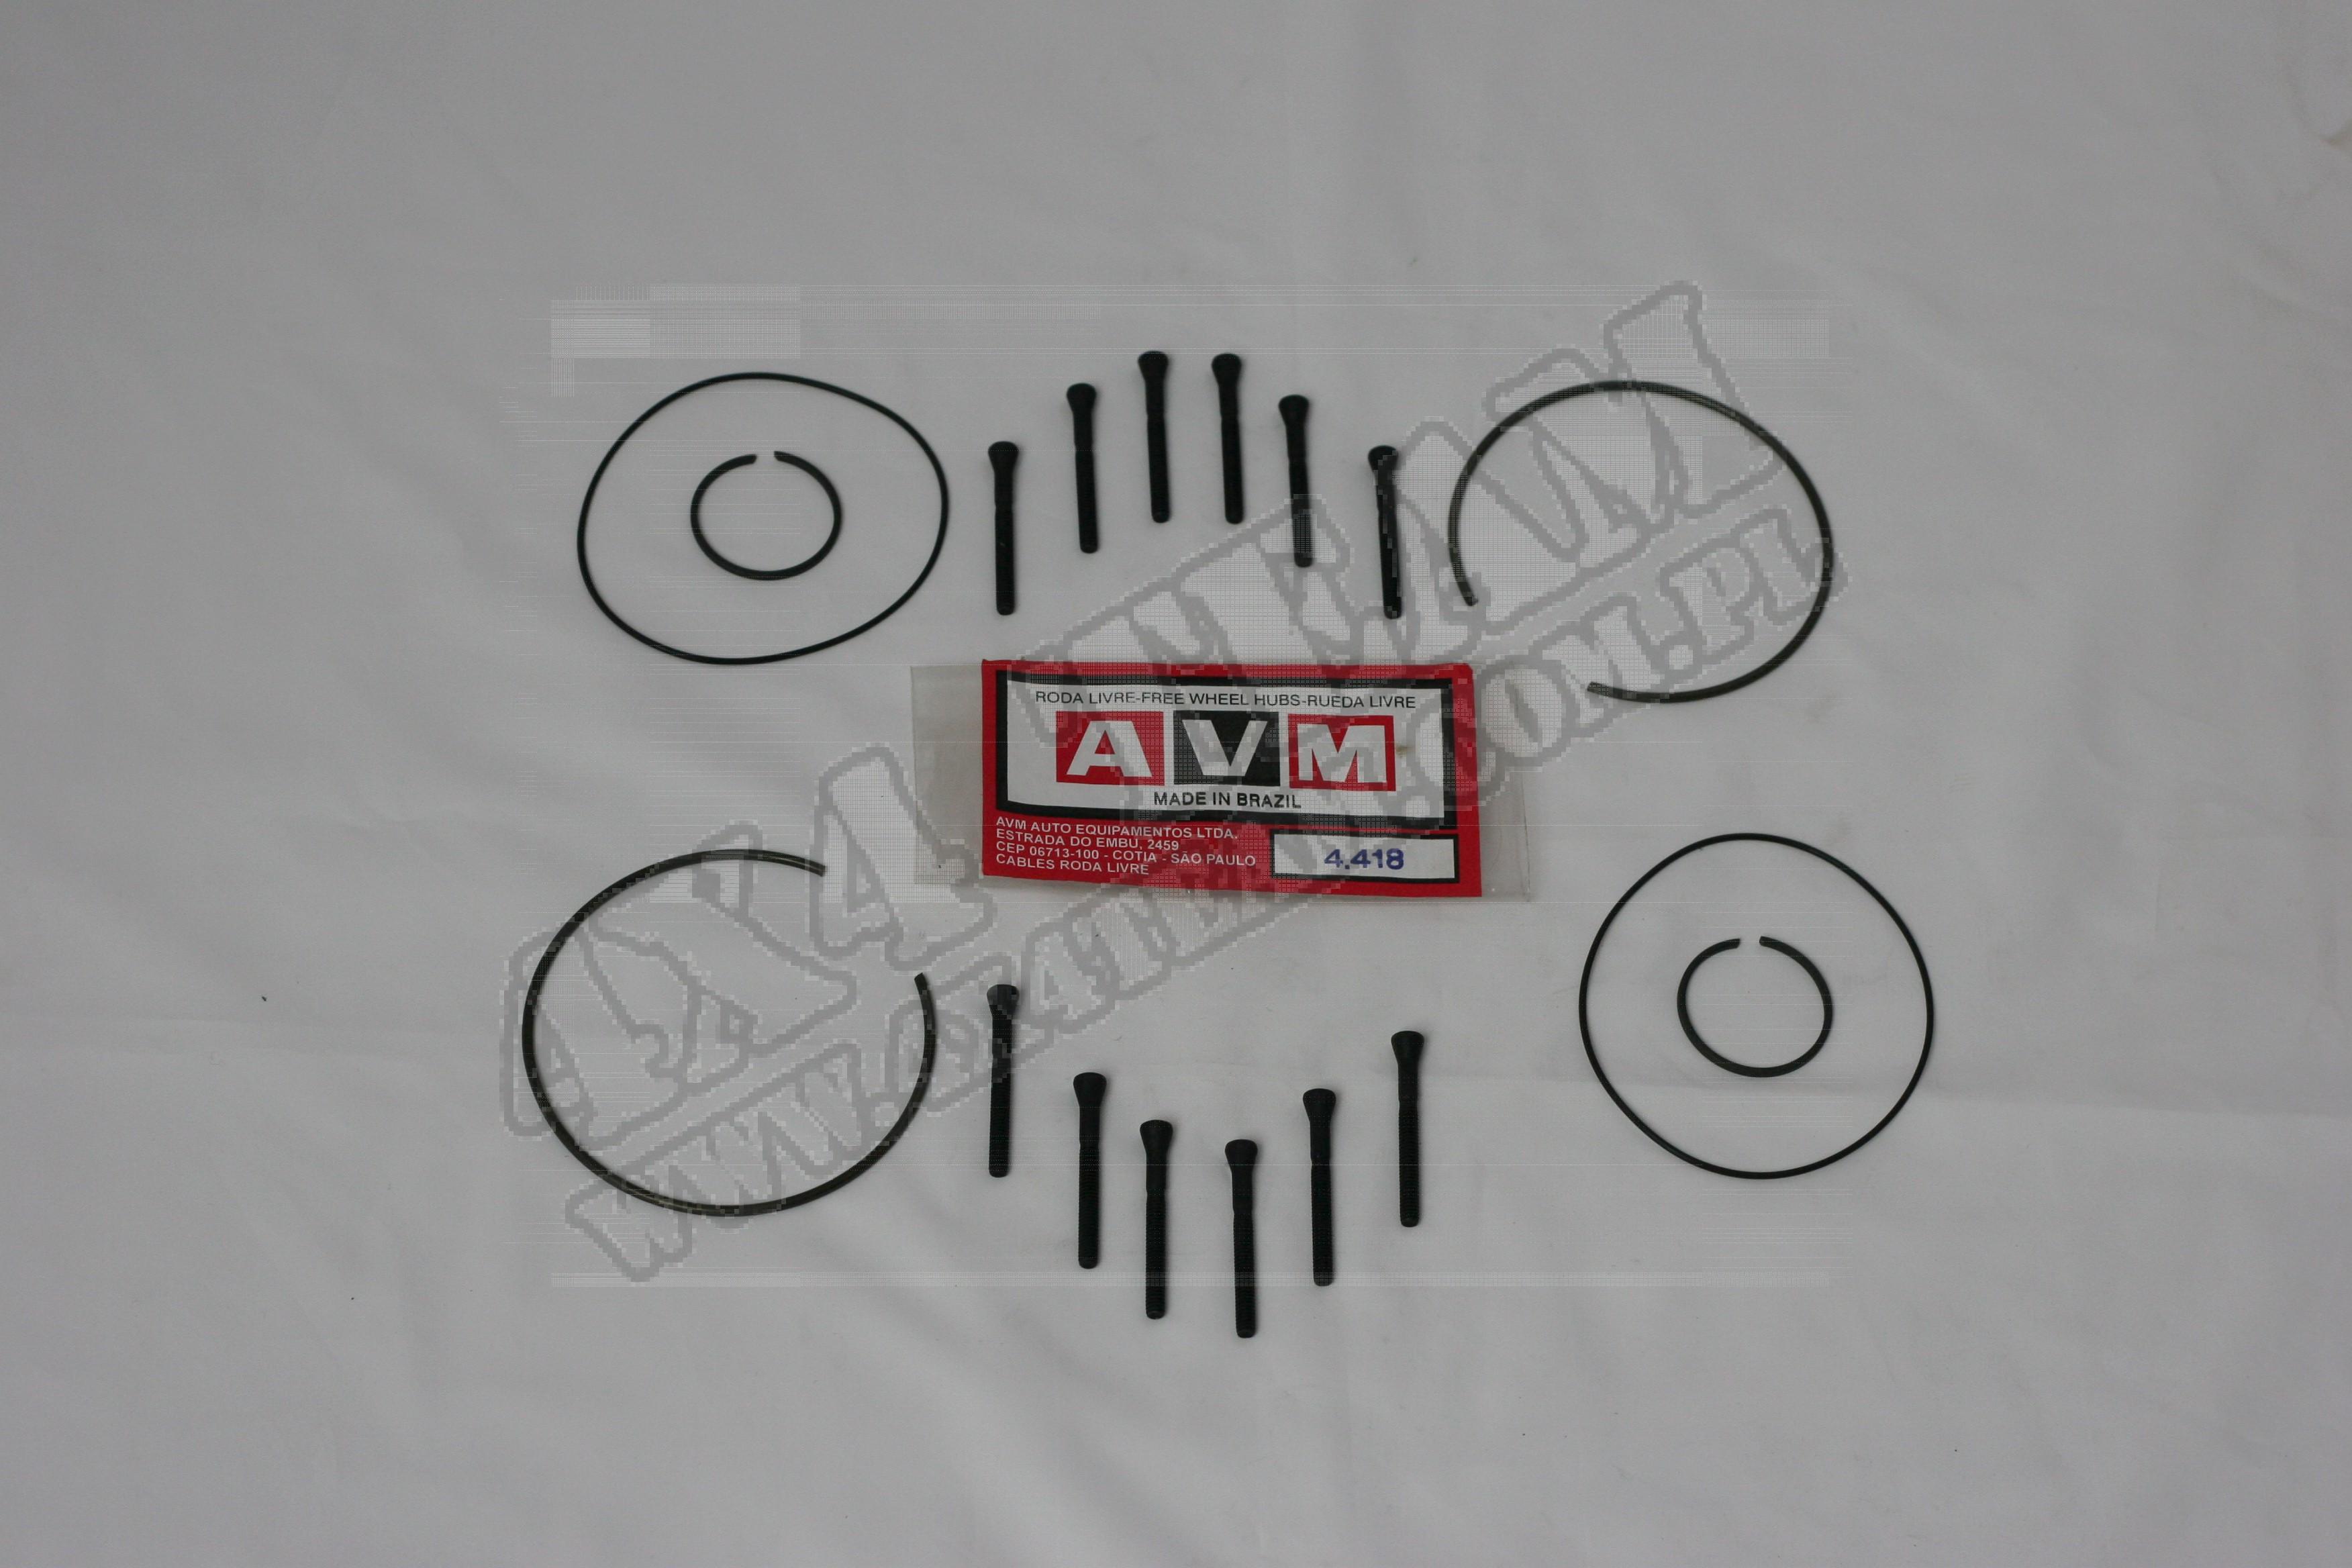 Zestaw serwisowy AVM 4.418